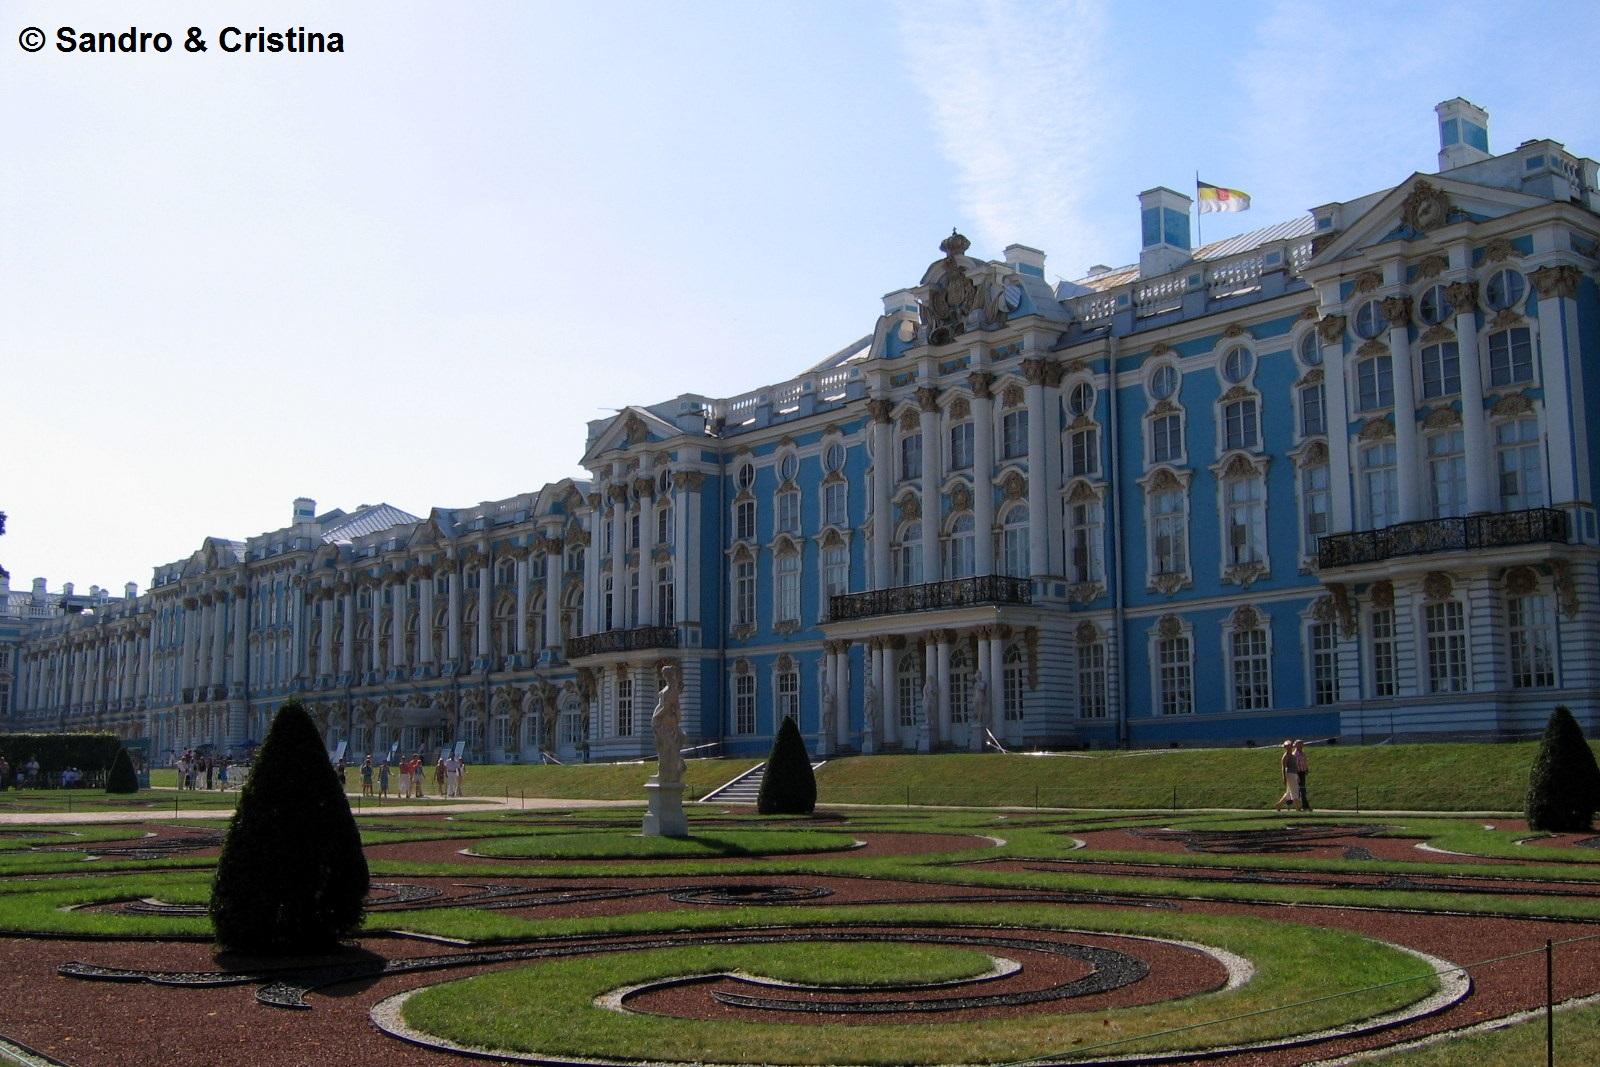 Sandro cristina russia san pietroburgo tsarskoje - San pietroburgo russia luoghi di interesse ...